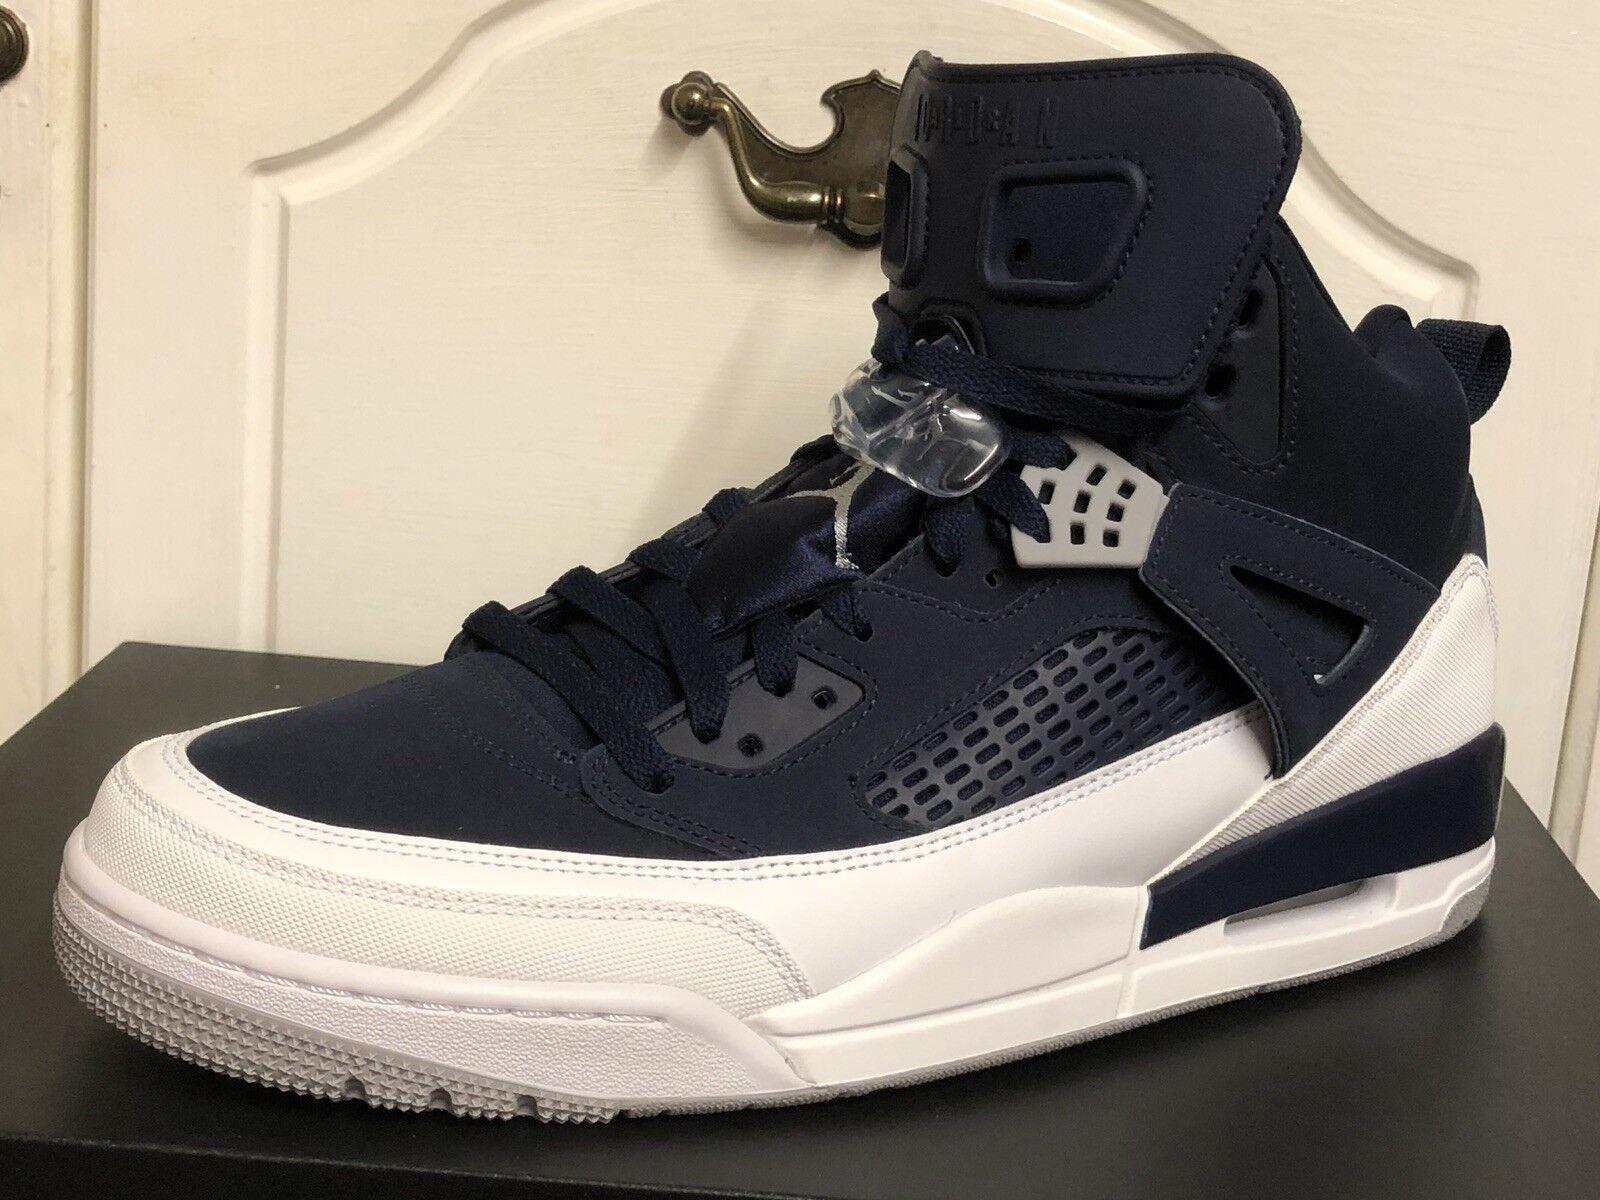 Nike AIR JORDAN SPIZIKE Hommes TRAINERS SNEAKERS Chaussures SIZE 12 EUR 47,5